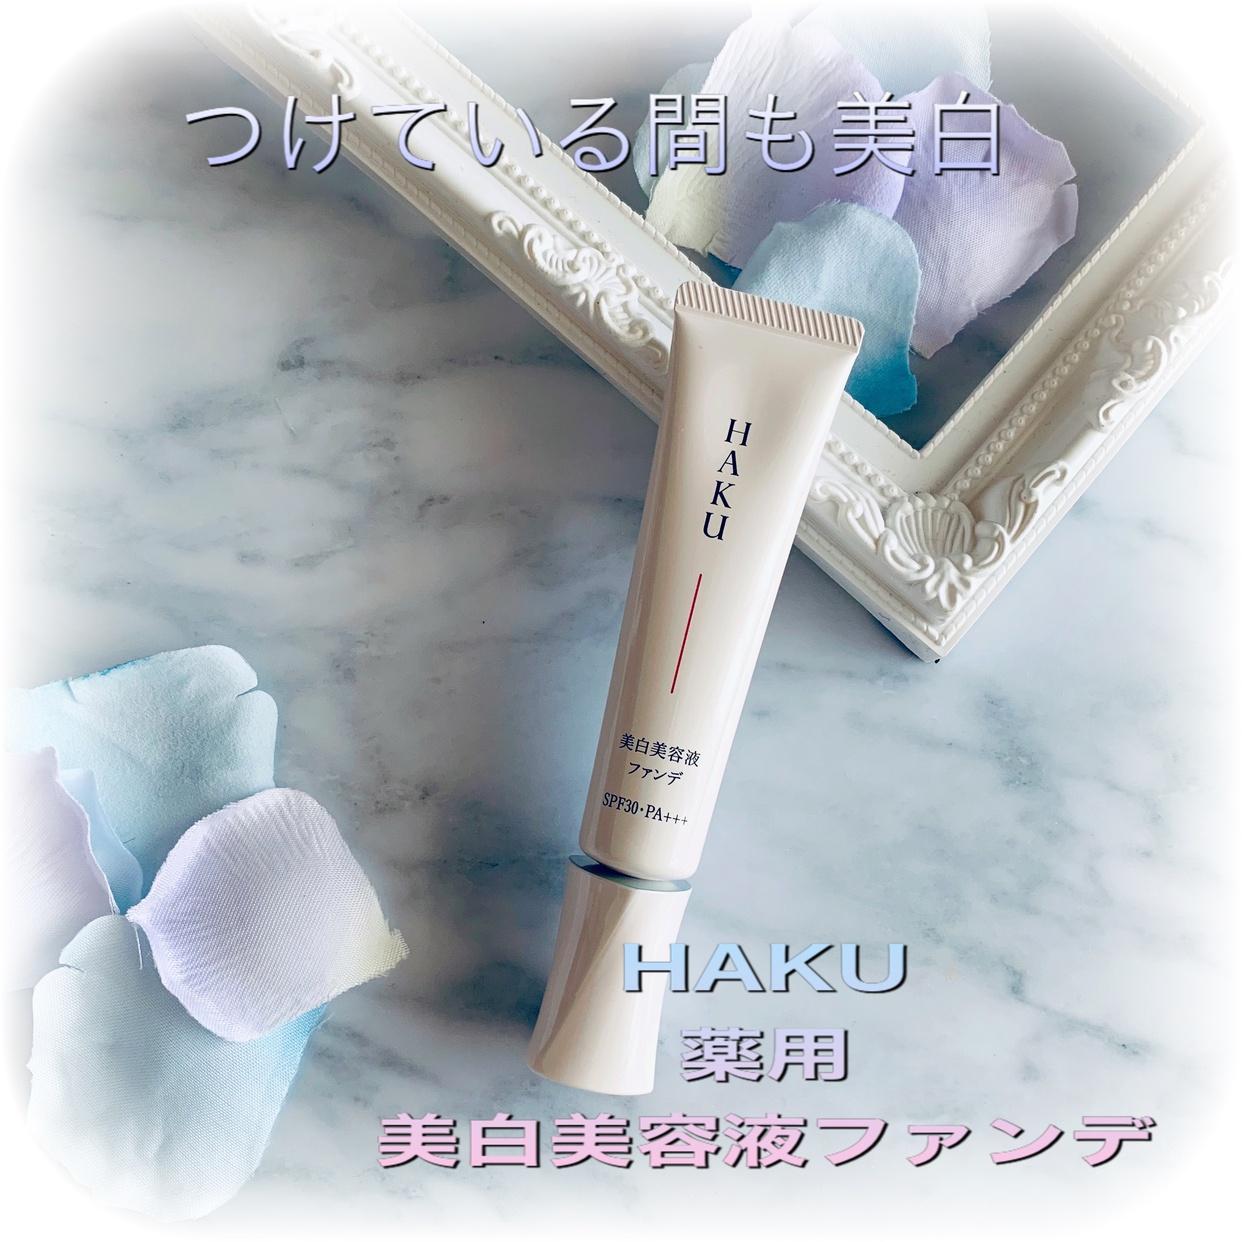 HAKU(ハク) 薬用 美白美容液ファンデを使ったsnowmiさんのクチコミ画像